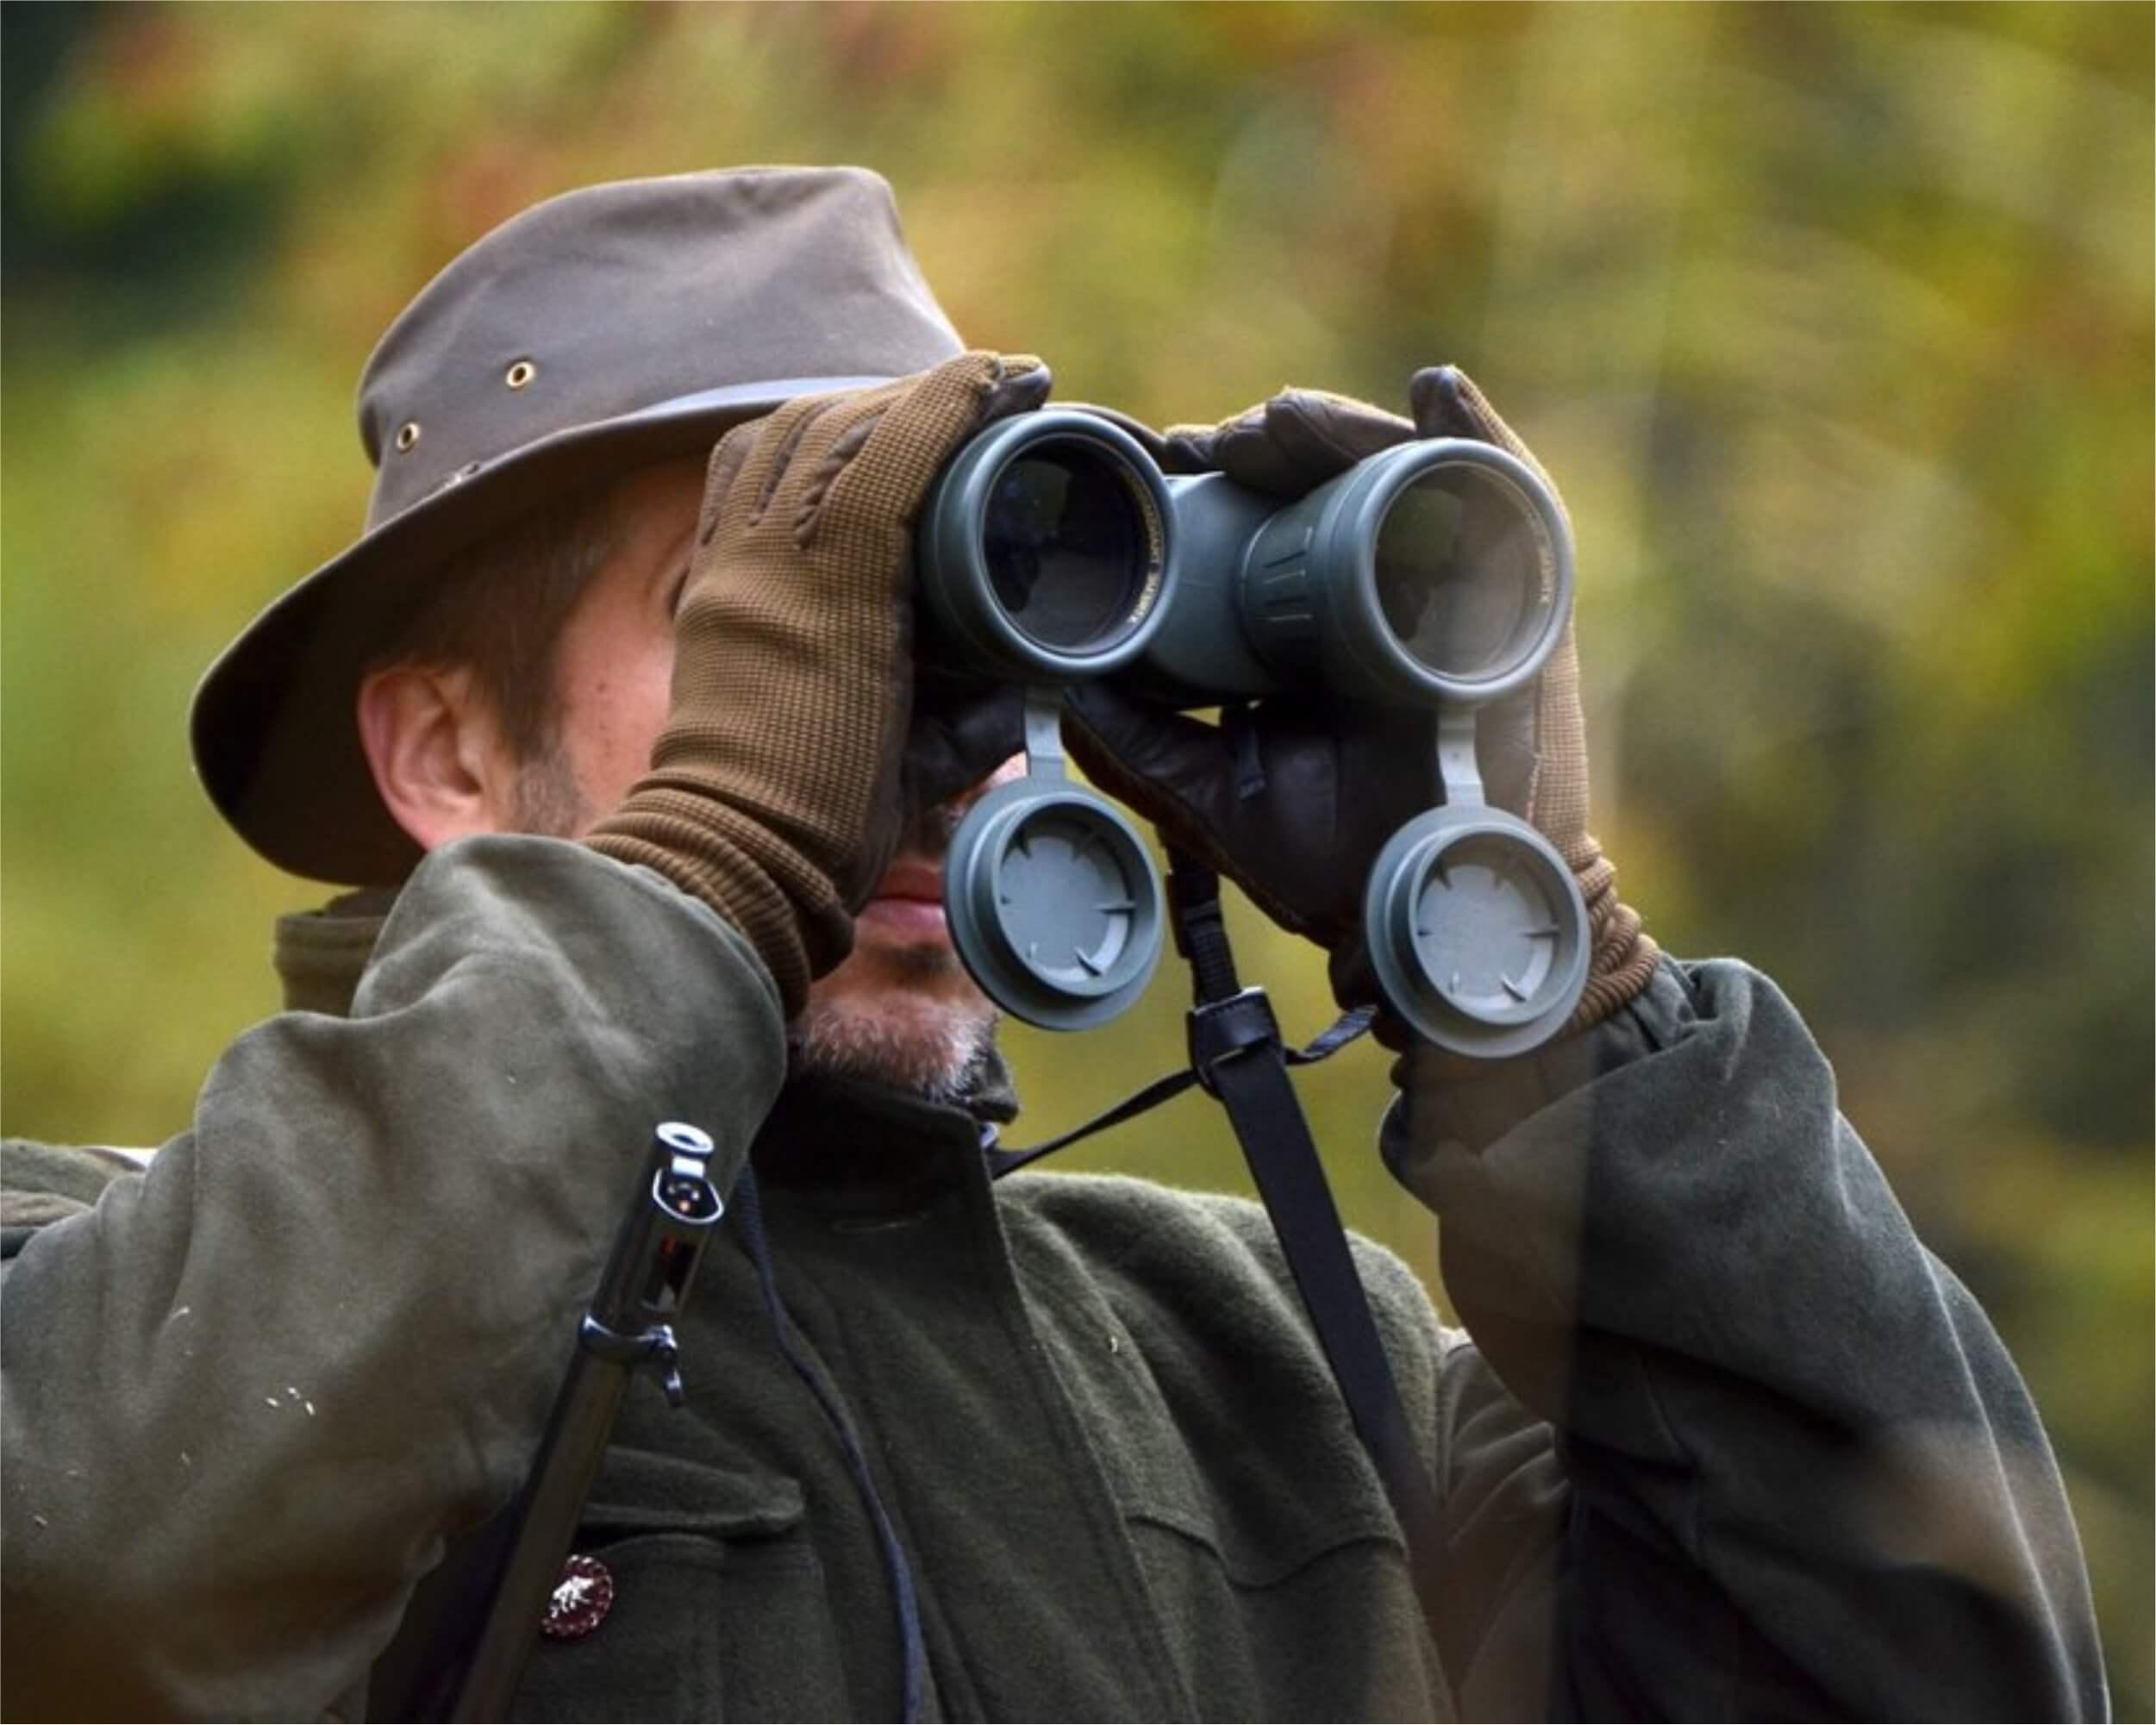 Guide for binoculars